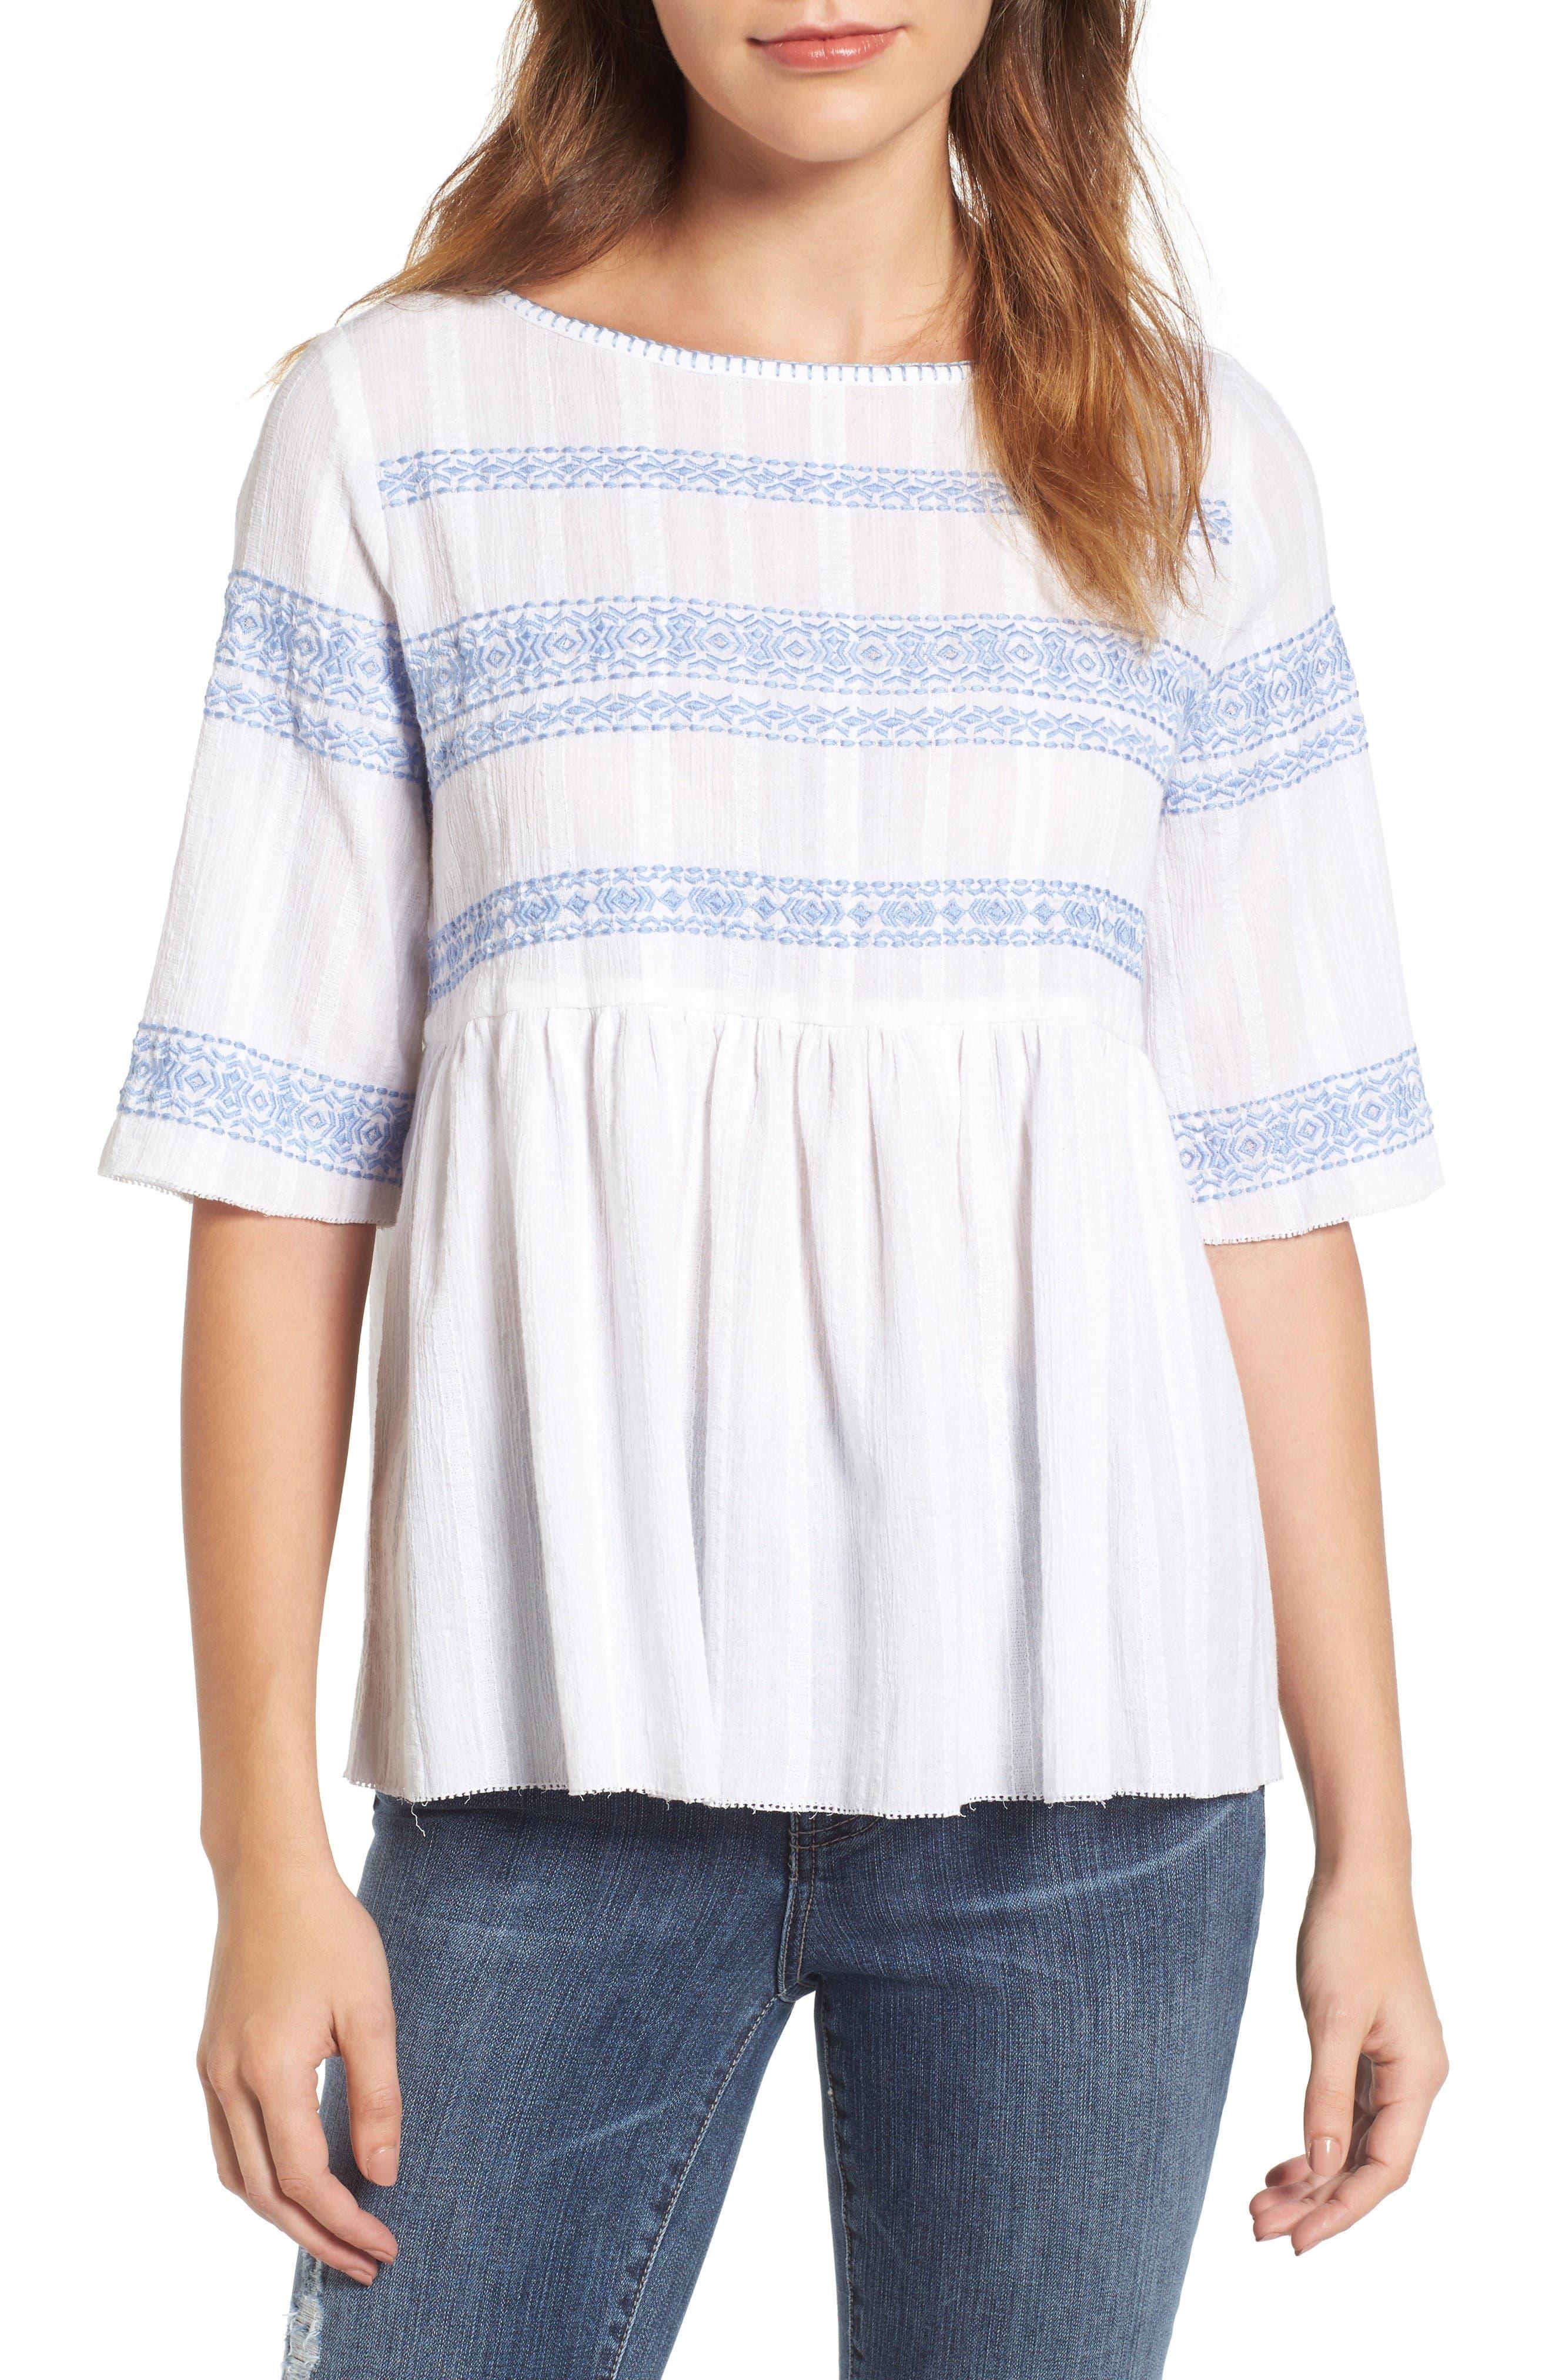 Alternate Image 1 Selected - Caslon® Embroidered Babydoll Top (Regular & Petite)